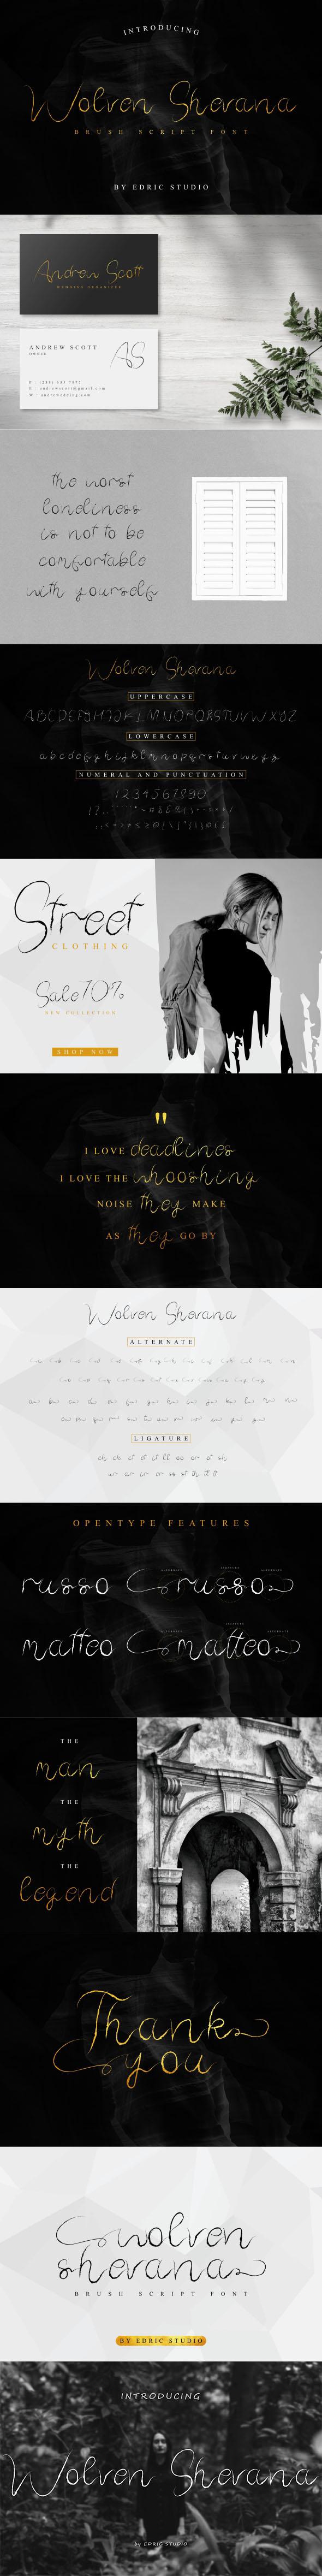 Wolven Shevana Font